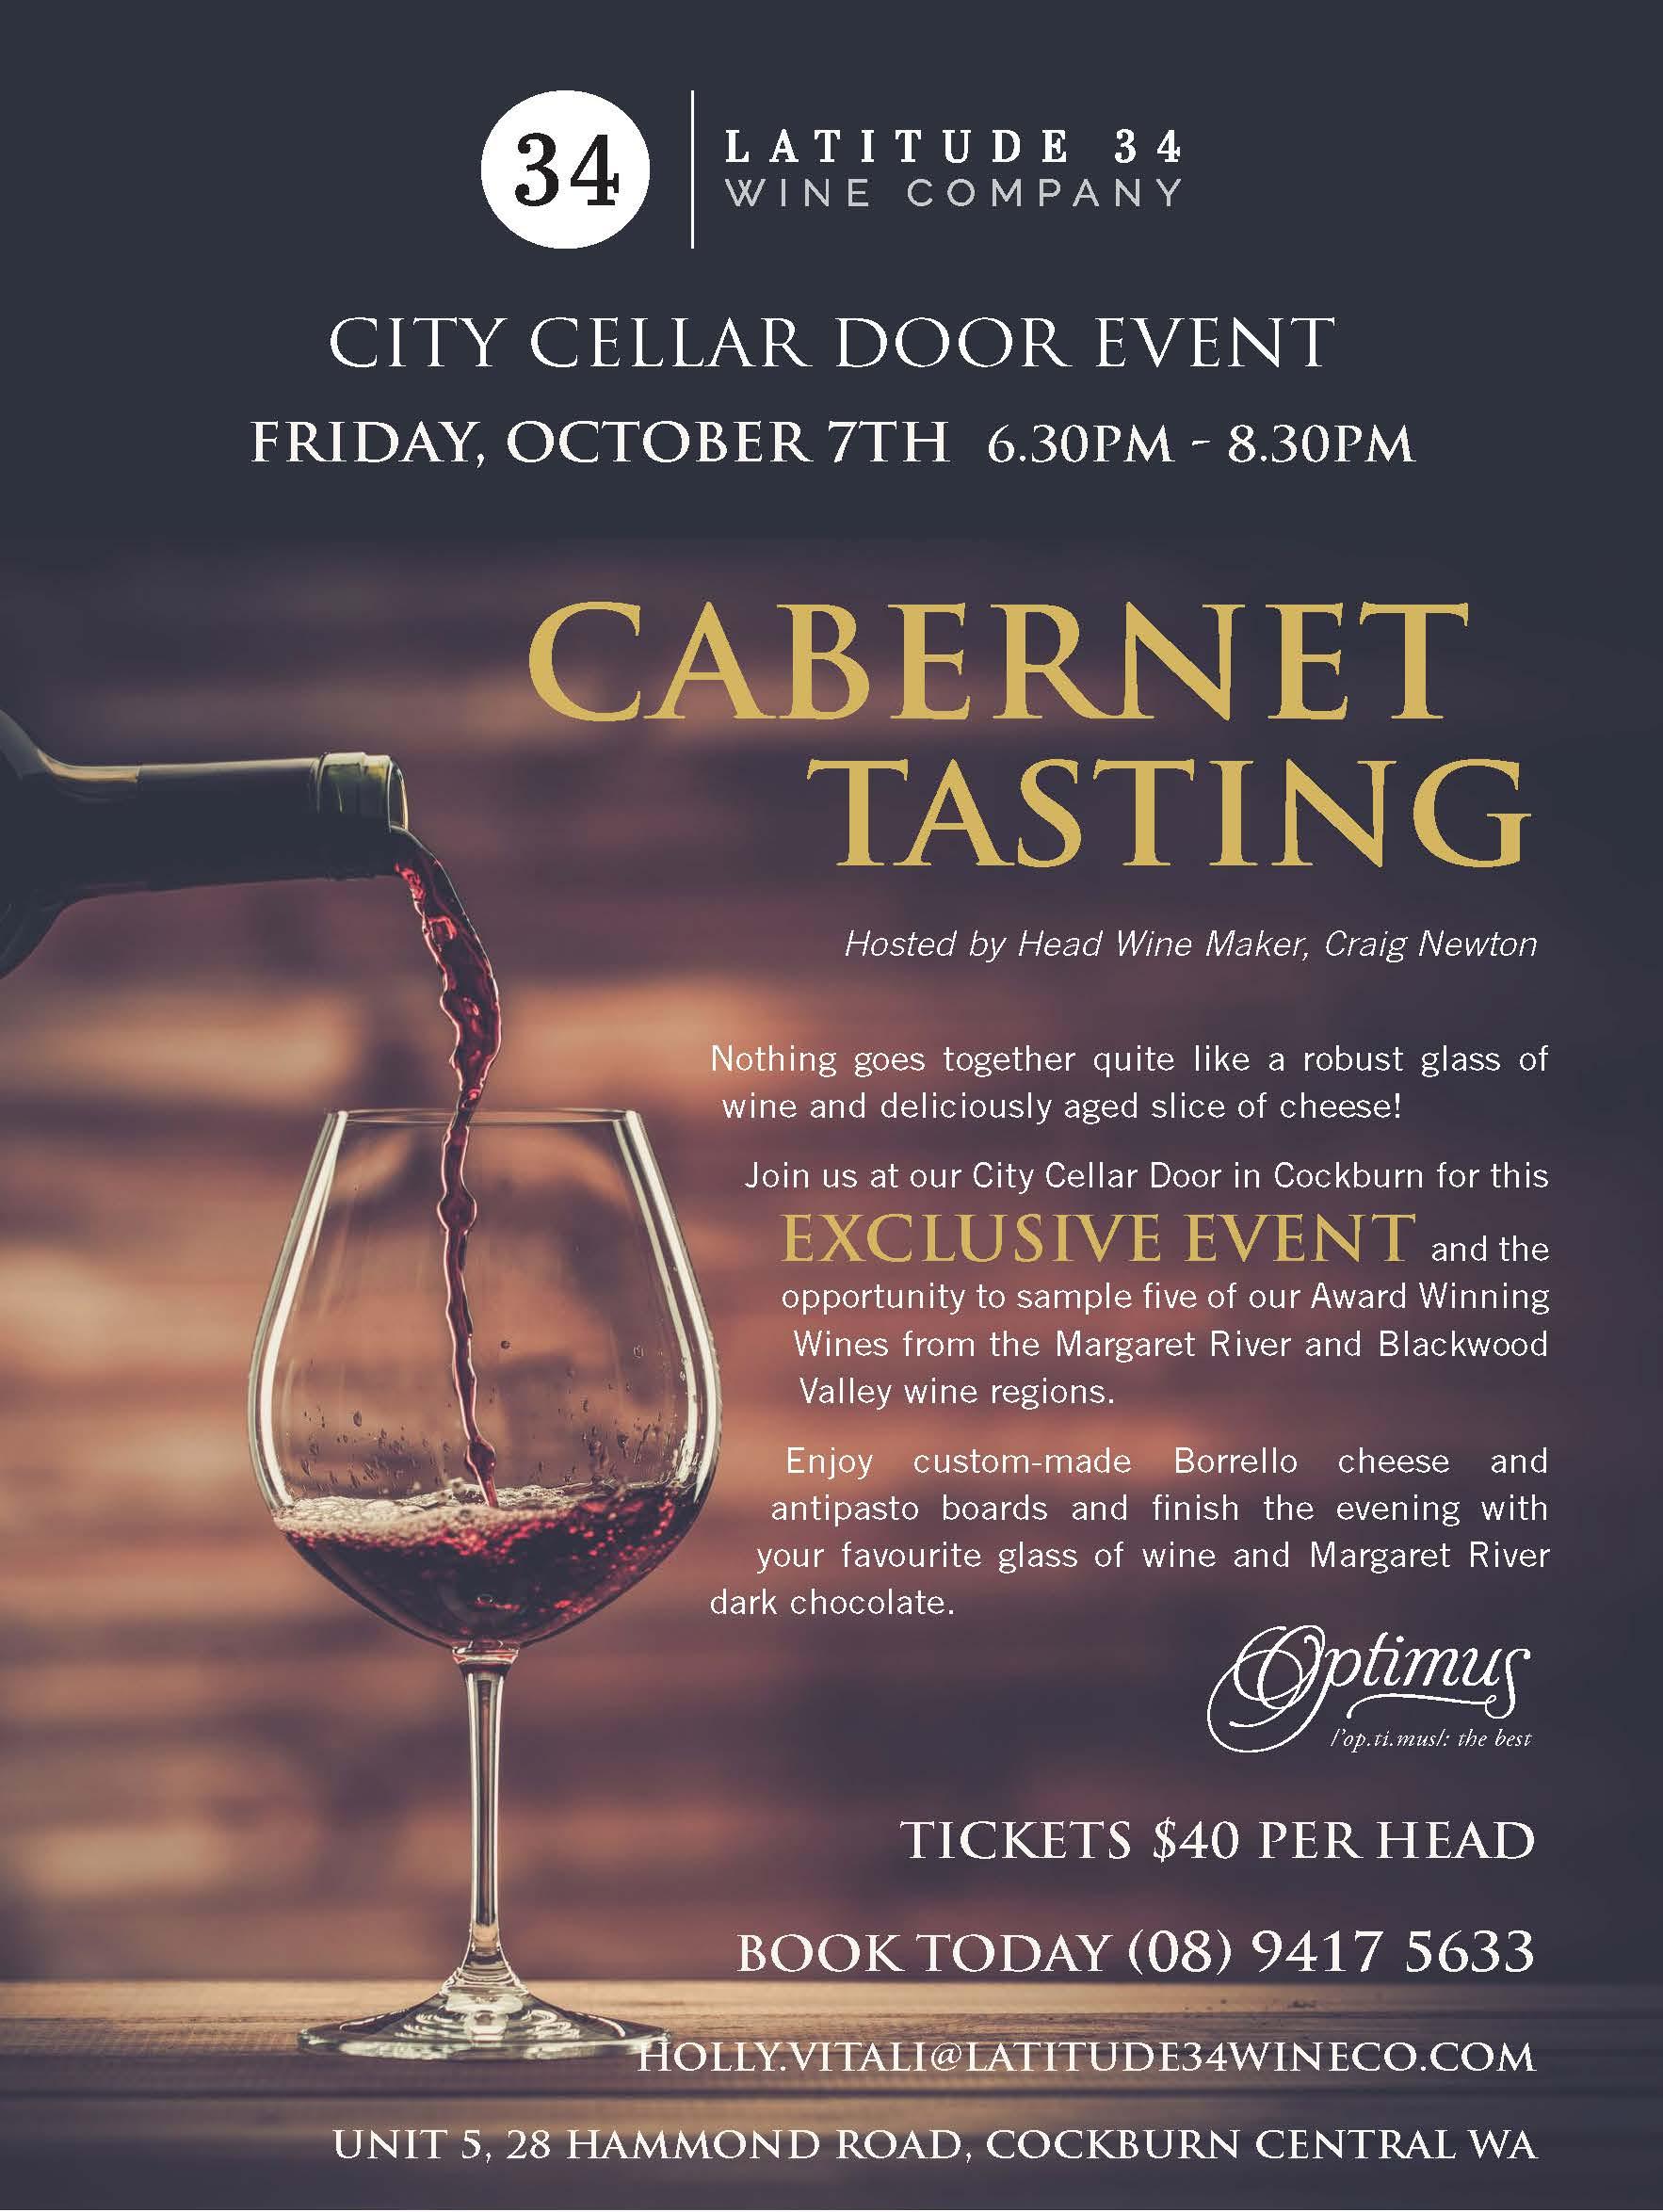 CCD Cabernet Tasting Invite 2016 10 07